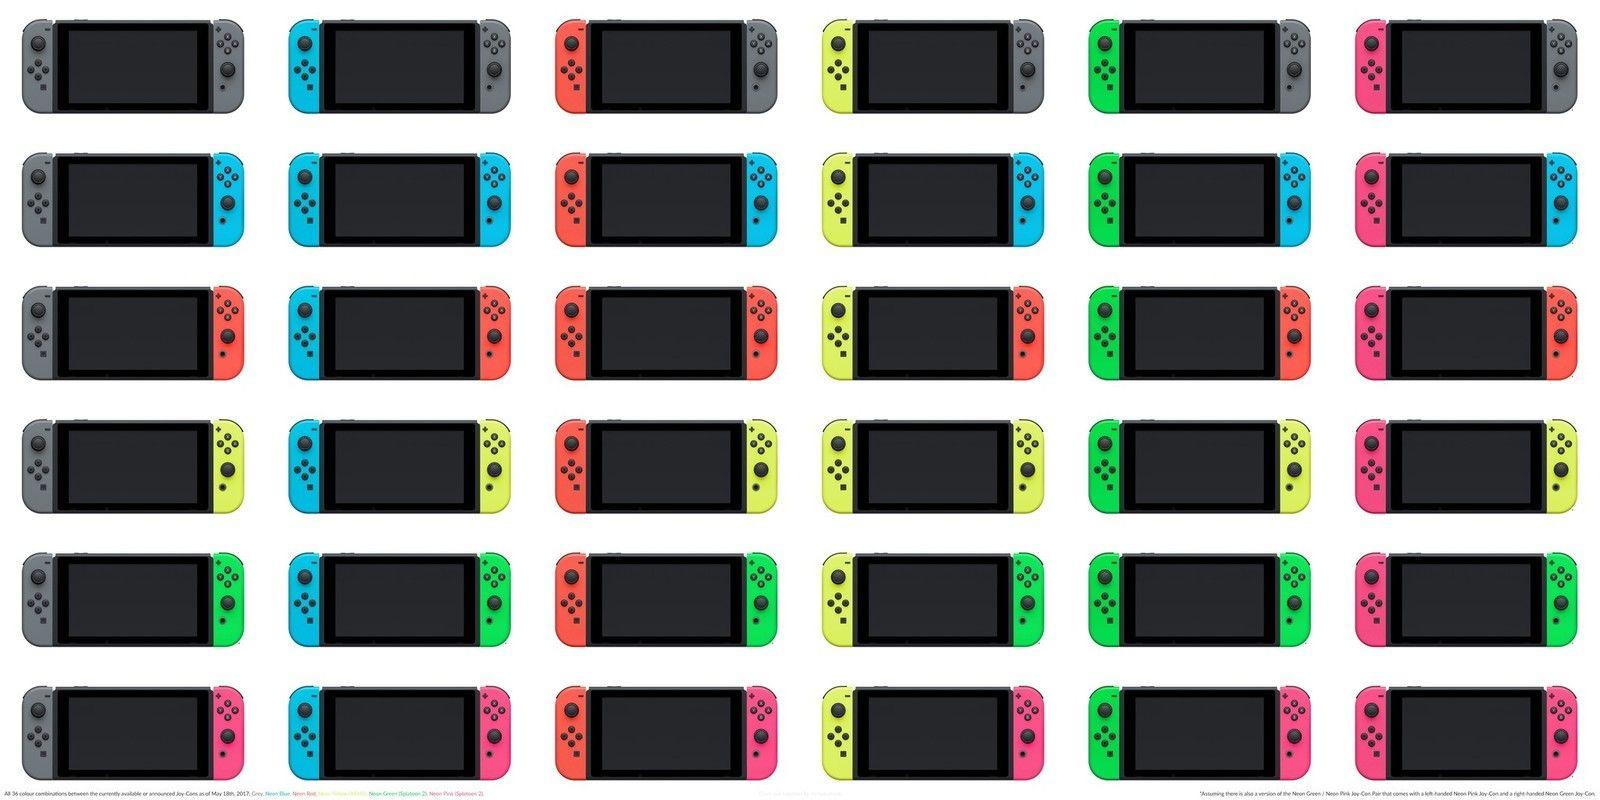 Every JoyCon controller color plus some customization